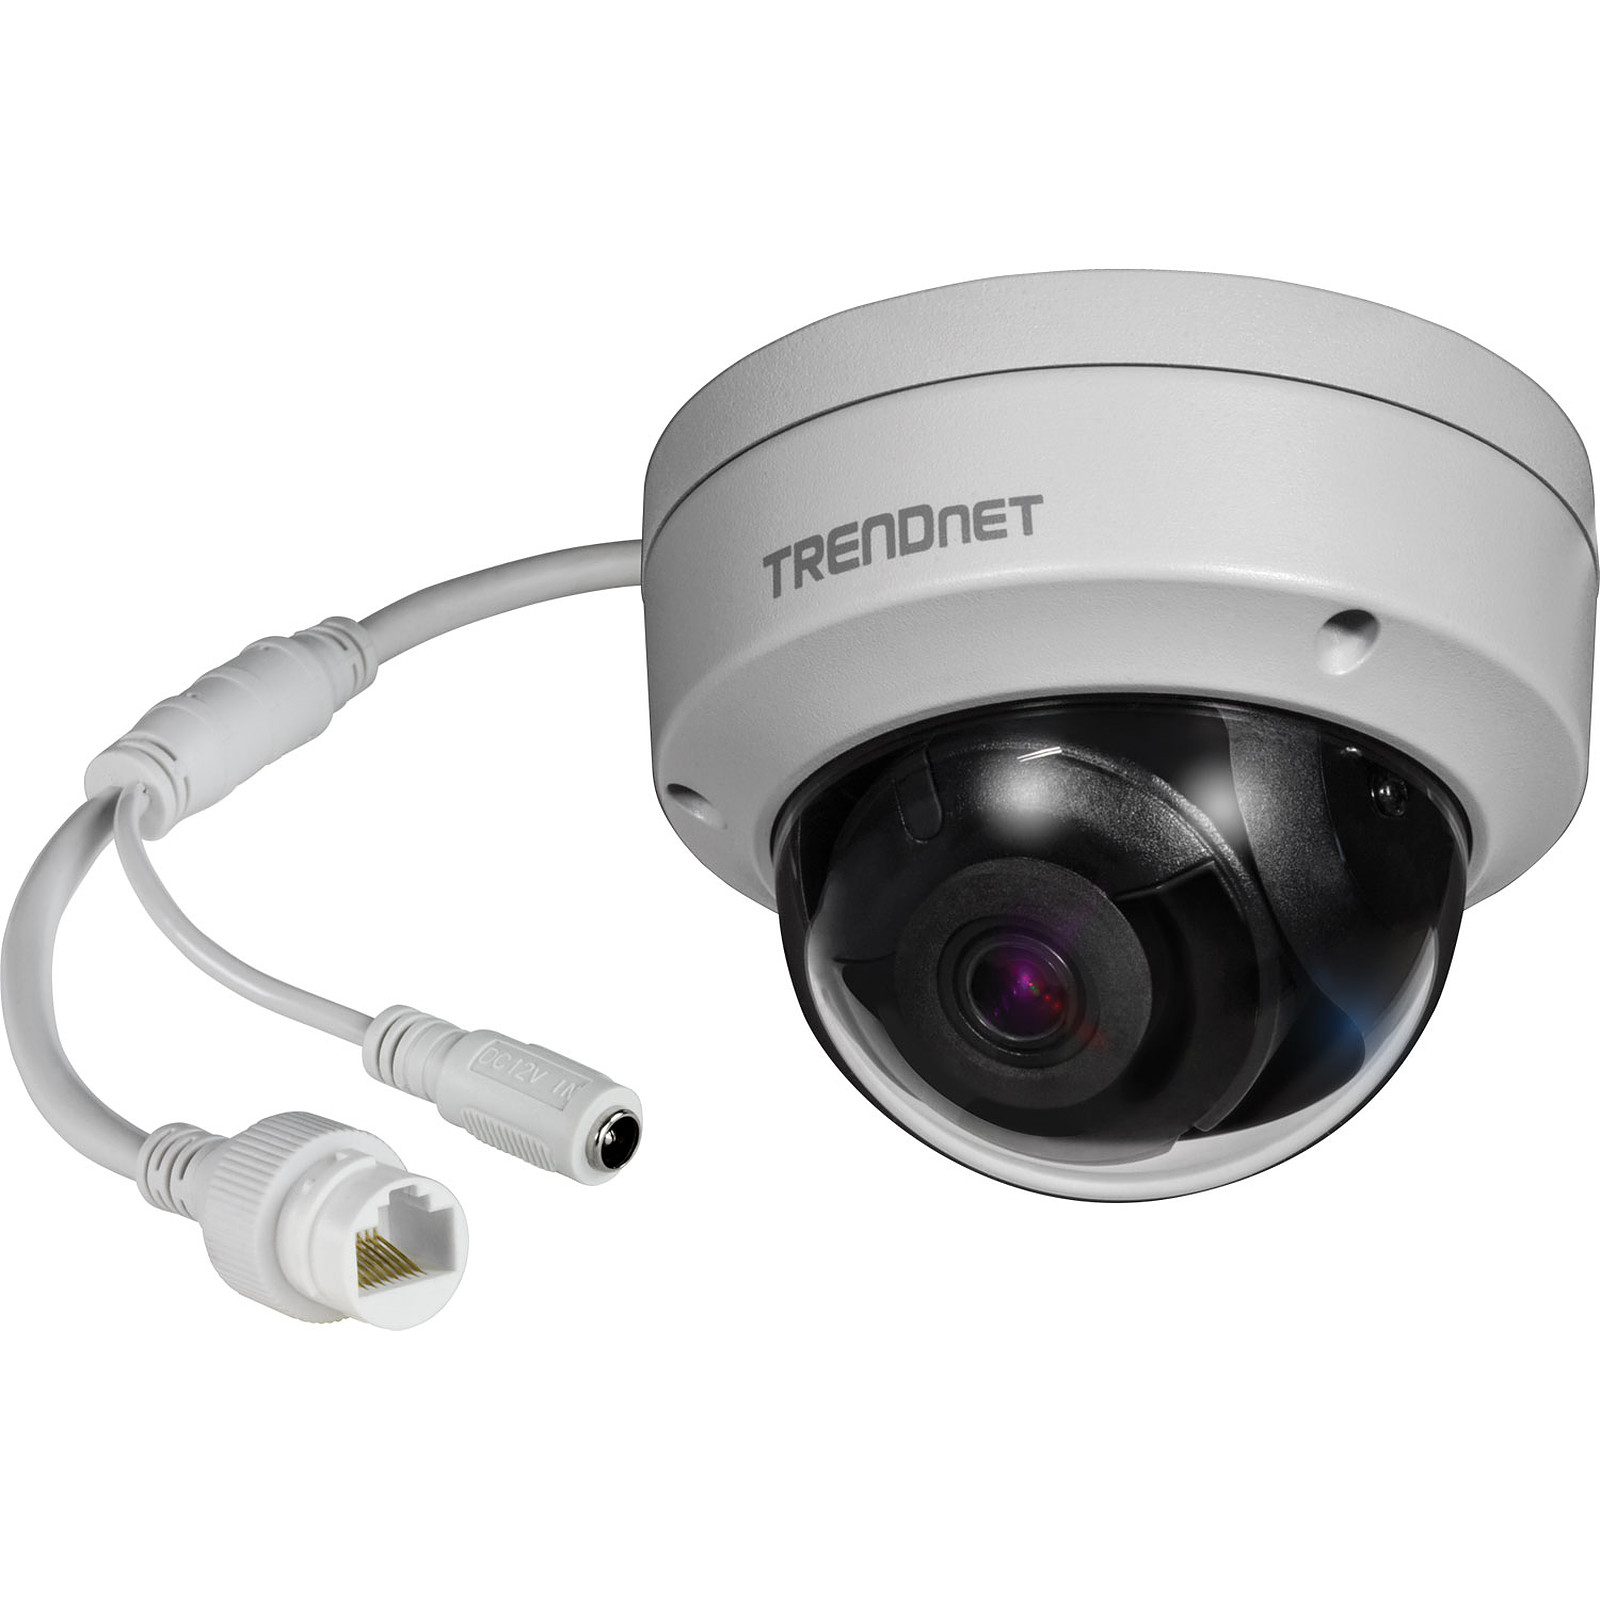 TRENDnet TV-IP319PI